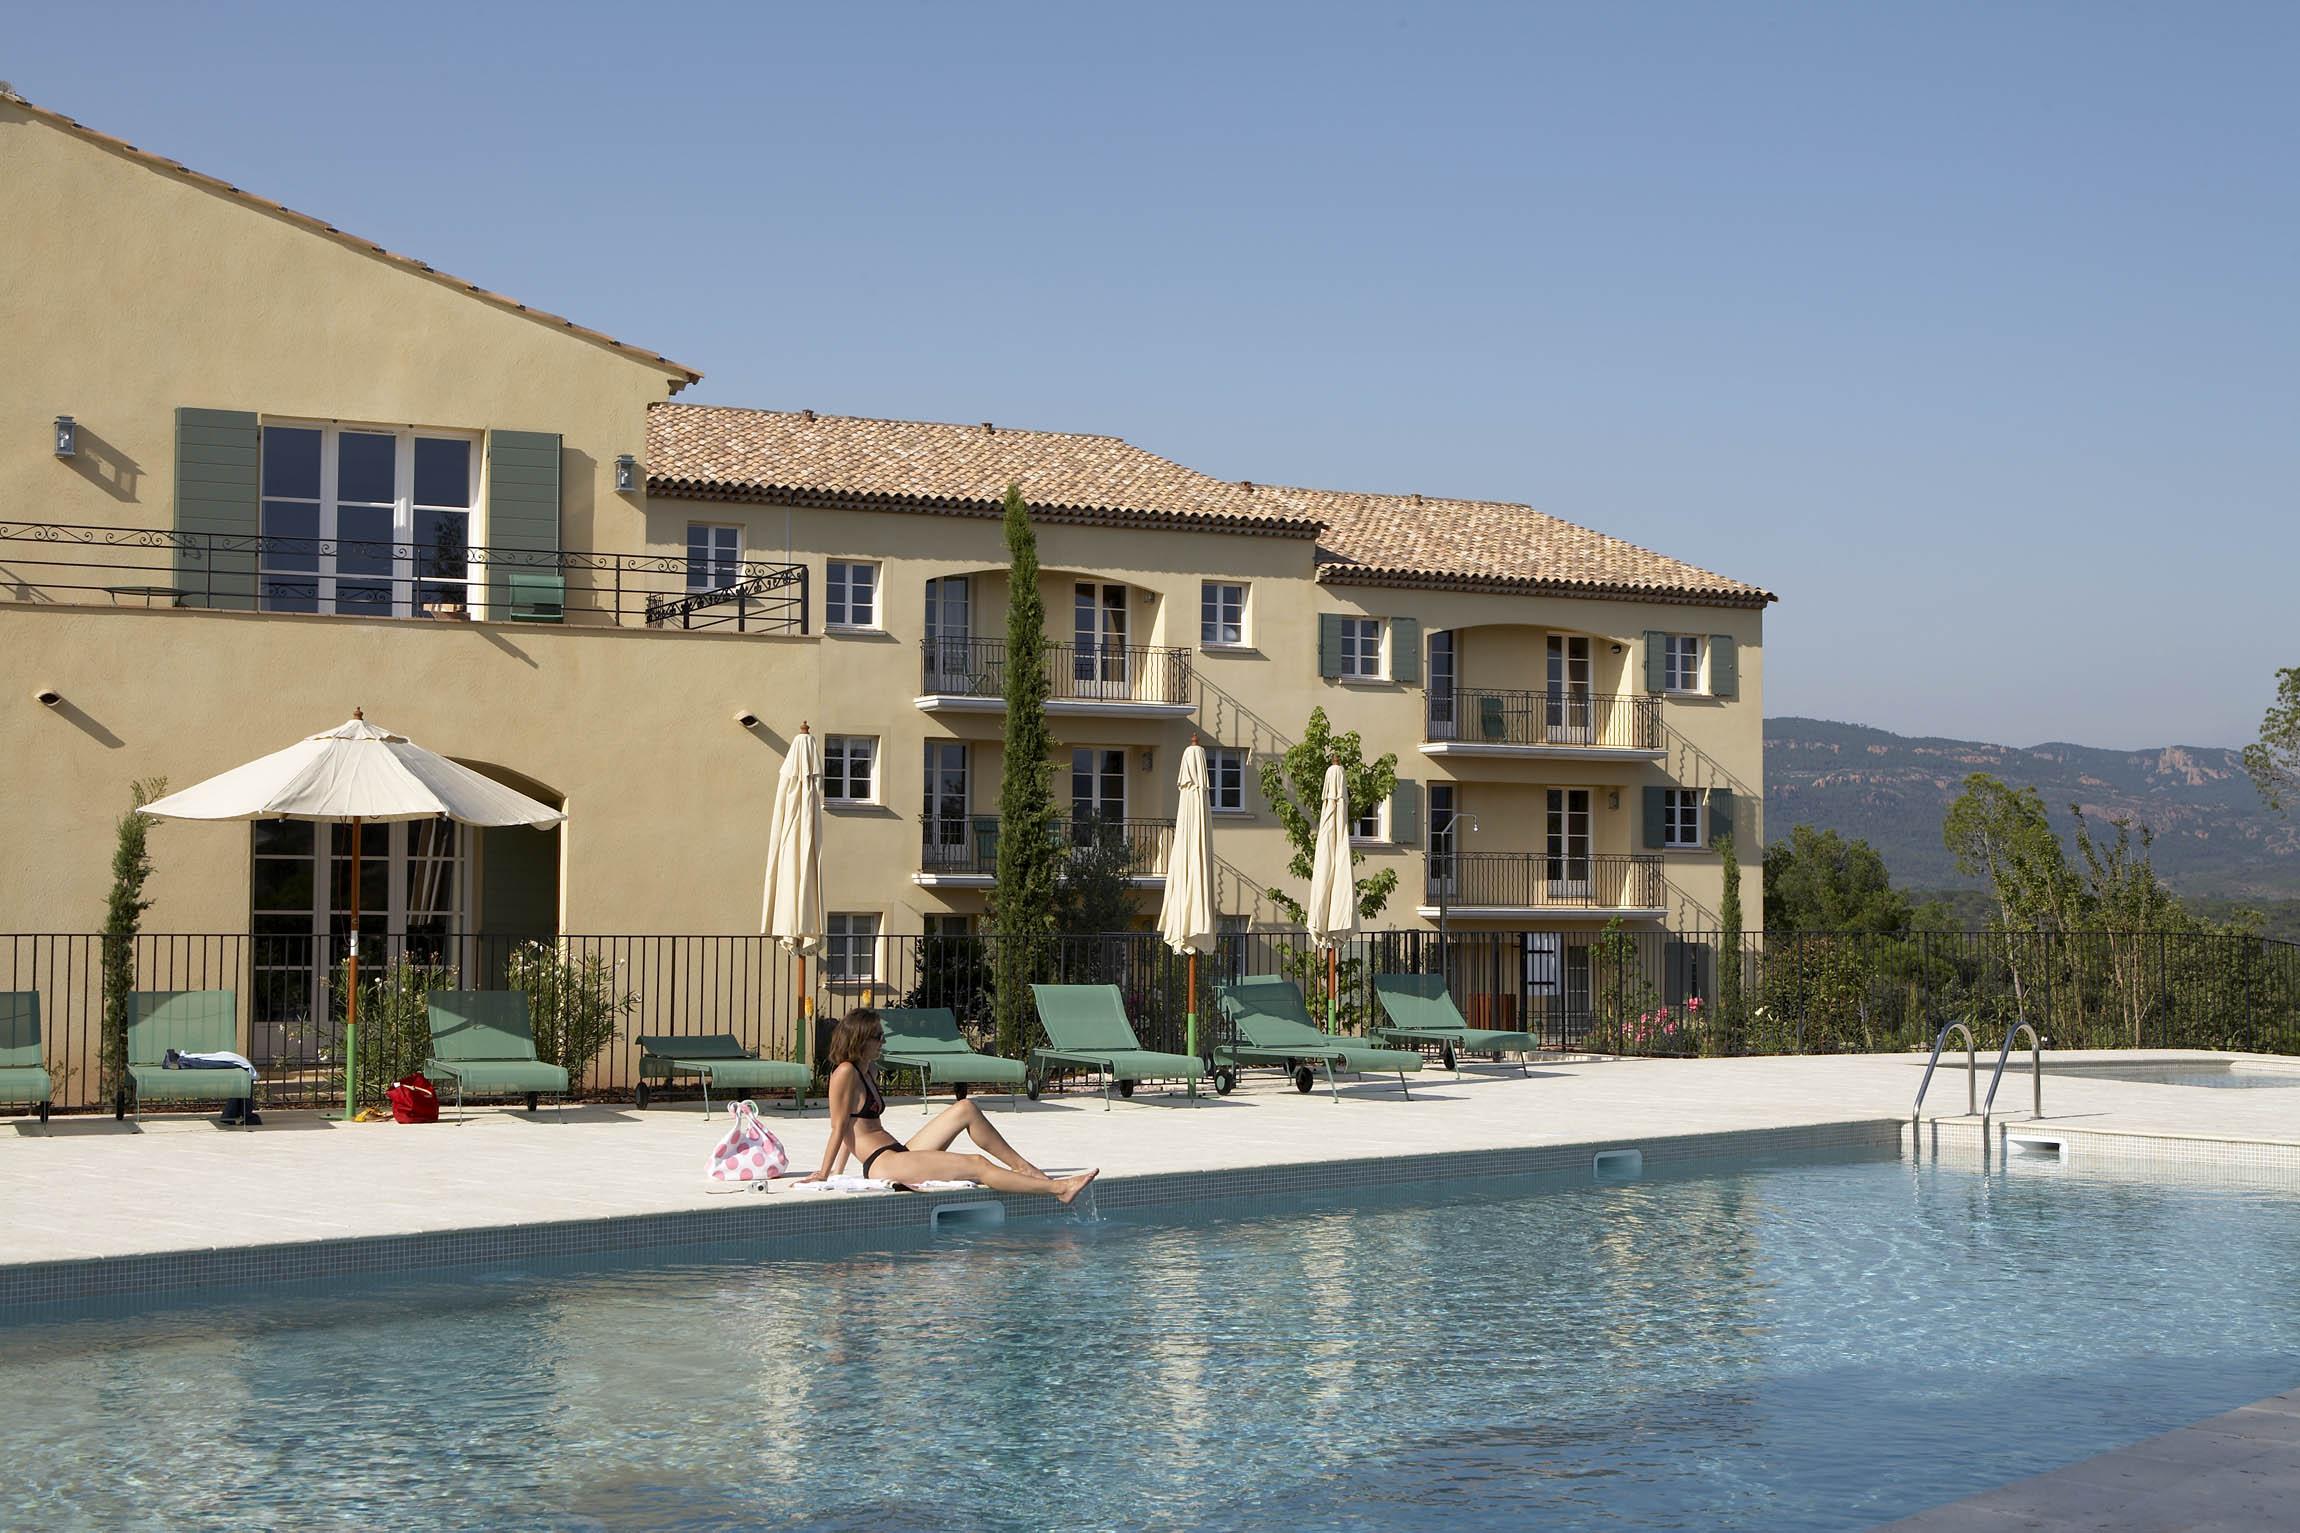 golf-expedition-golf-reizen-frankrijk-regio-cote-d'azur-Les-Domaines-de-Saint-Endréol-Golf-en-Spa-Resort-villa-met-aanliggend-zwembad